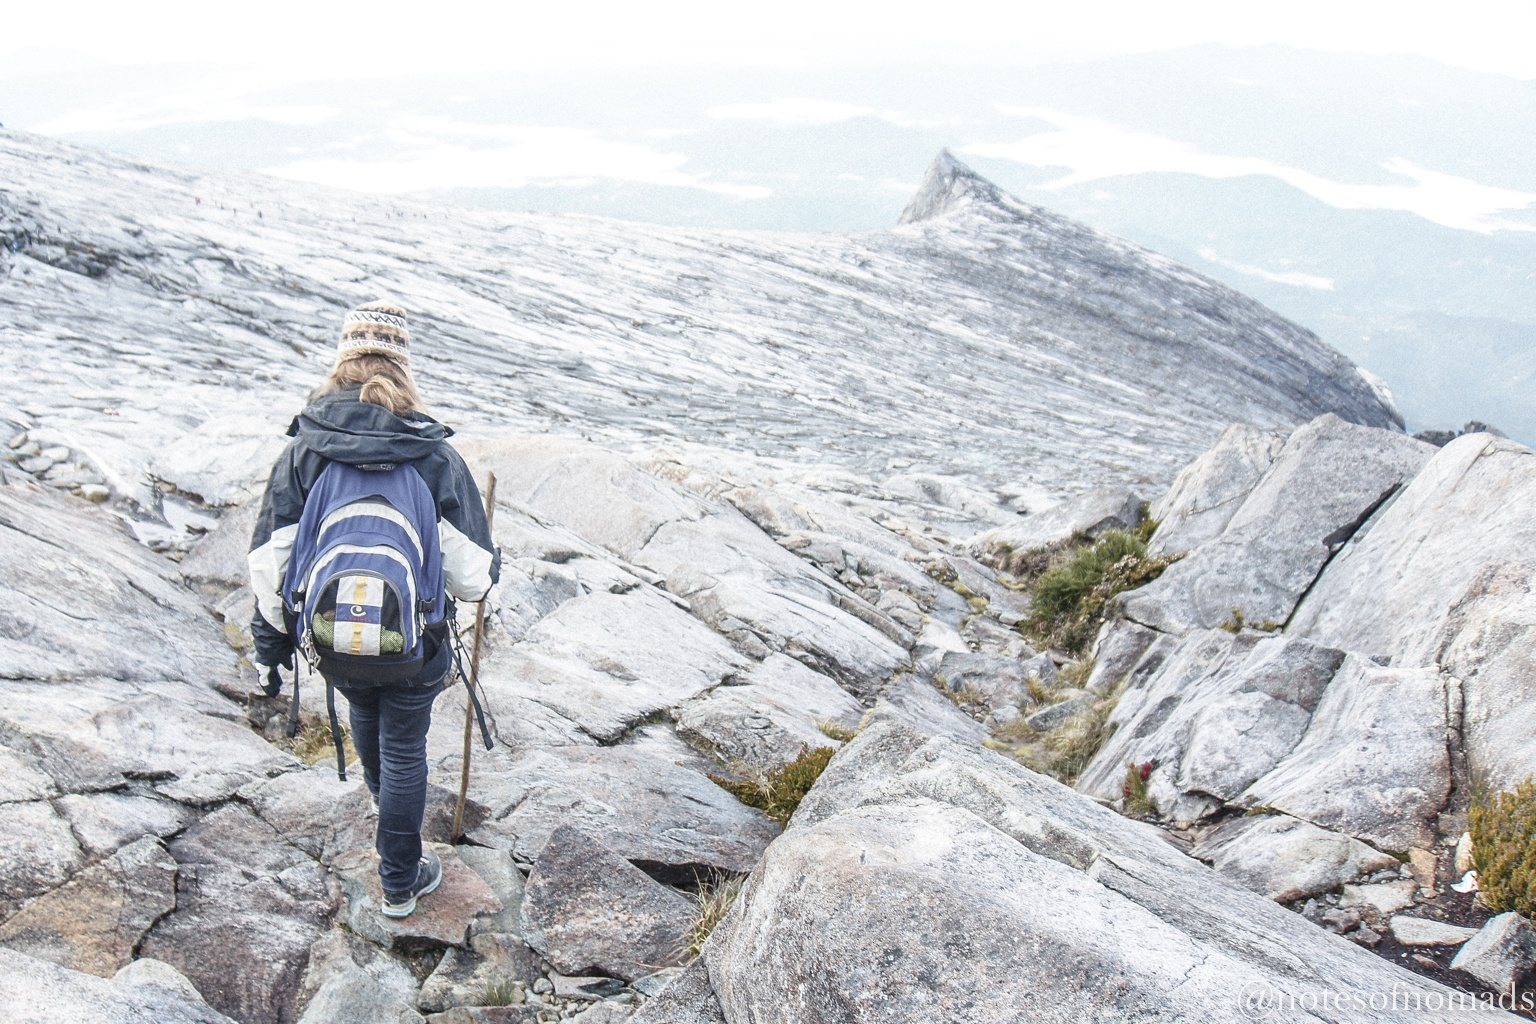 Climbing Mt. Kinabalu on a Budget